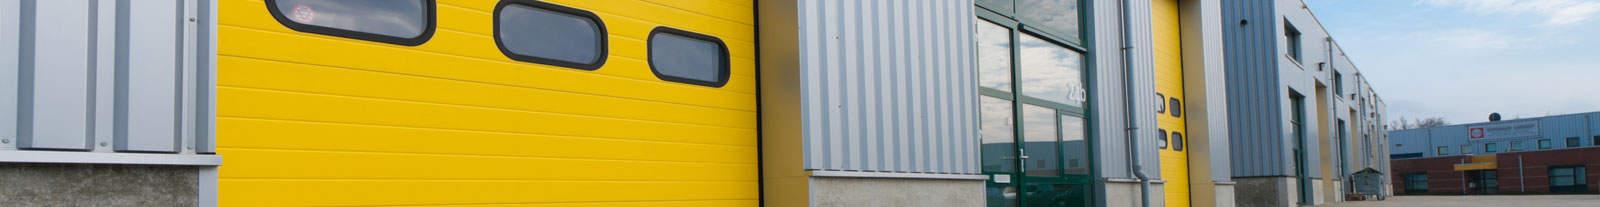 puertas-automaticas-grupo-lasser-2